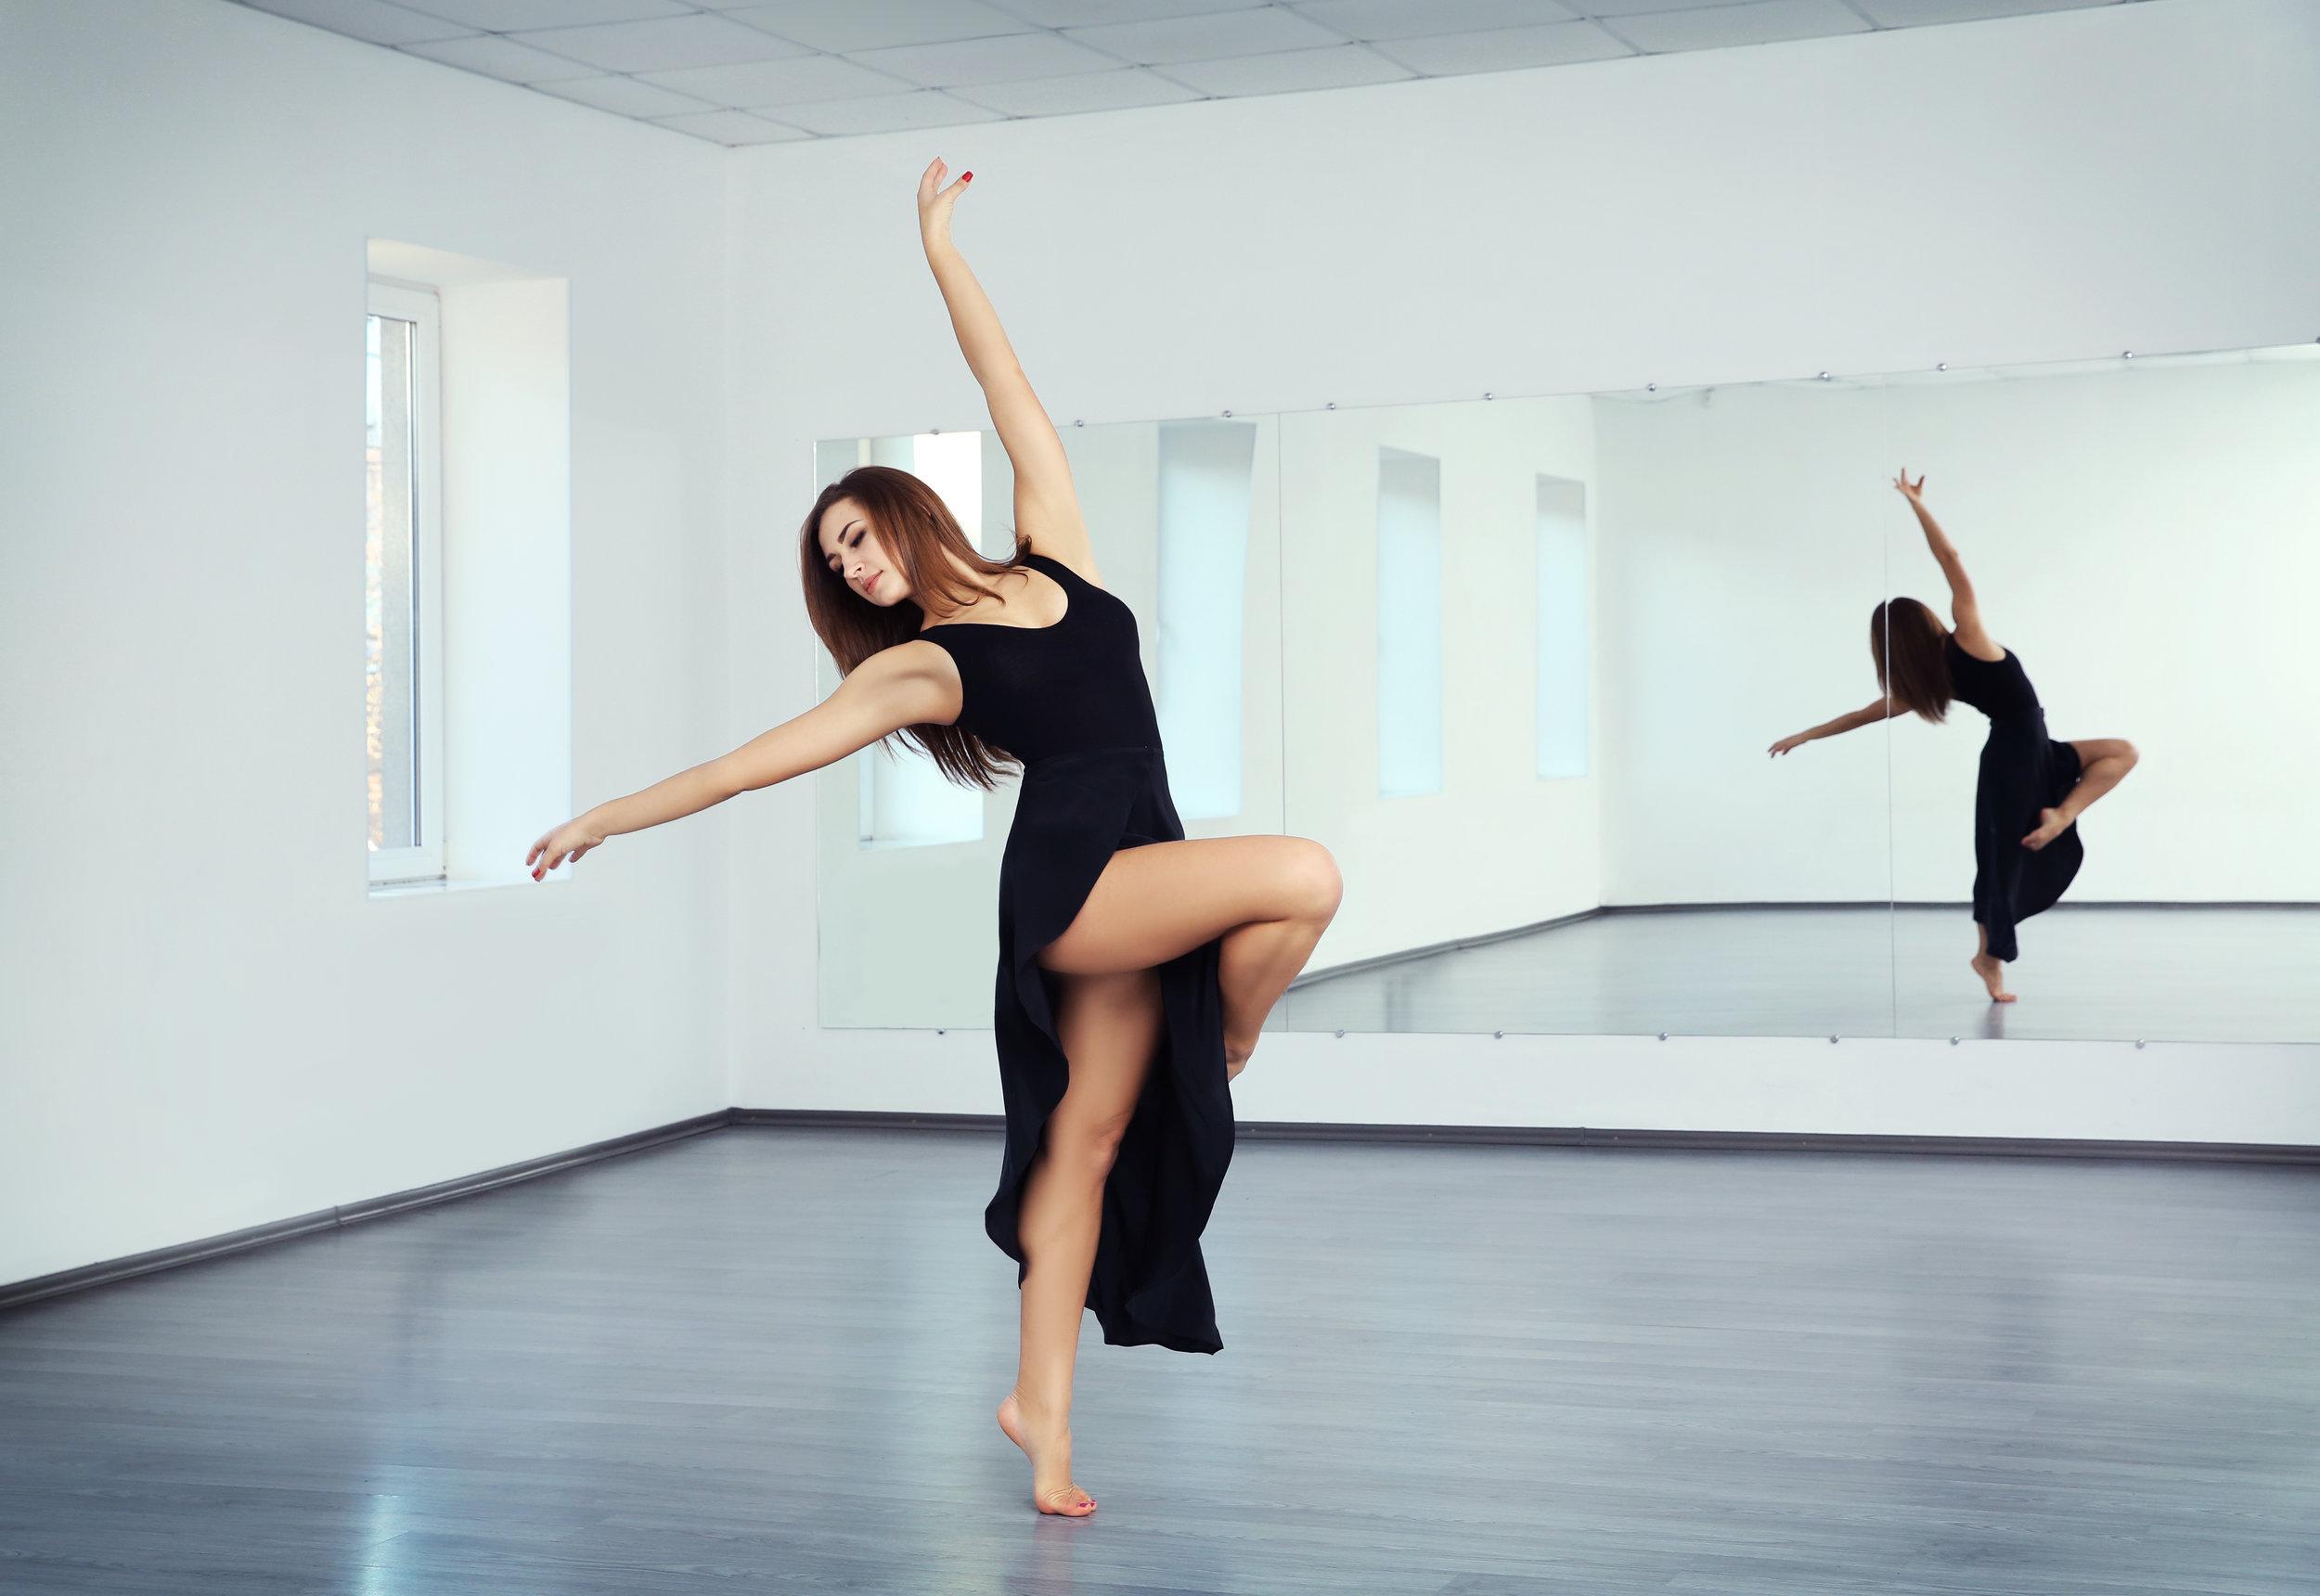 dance studio wall mirror